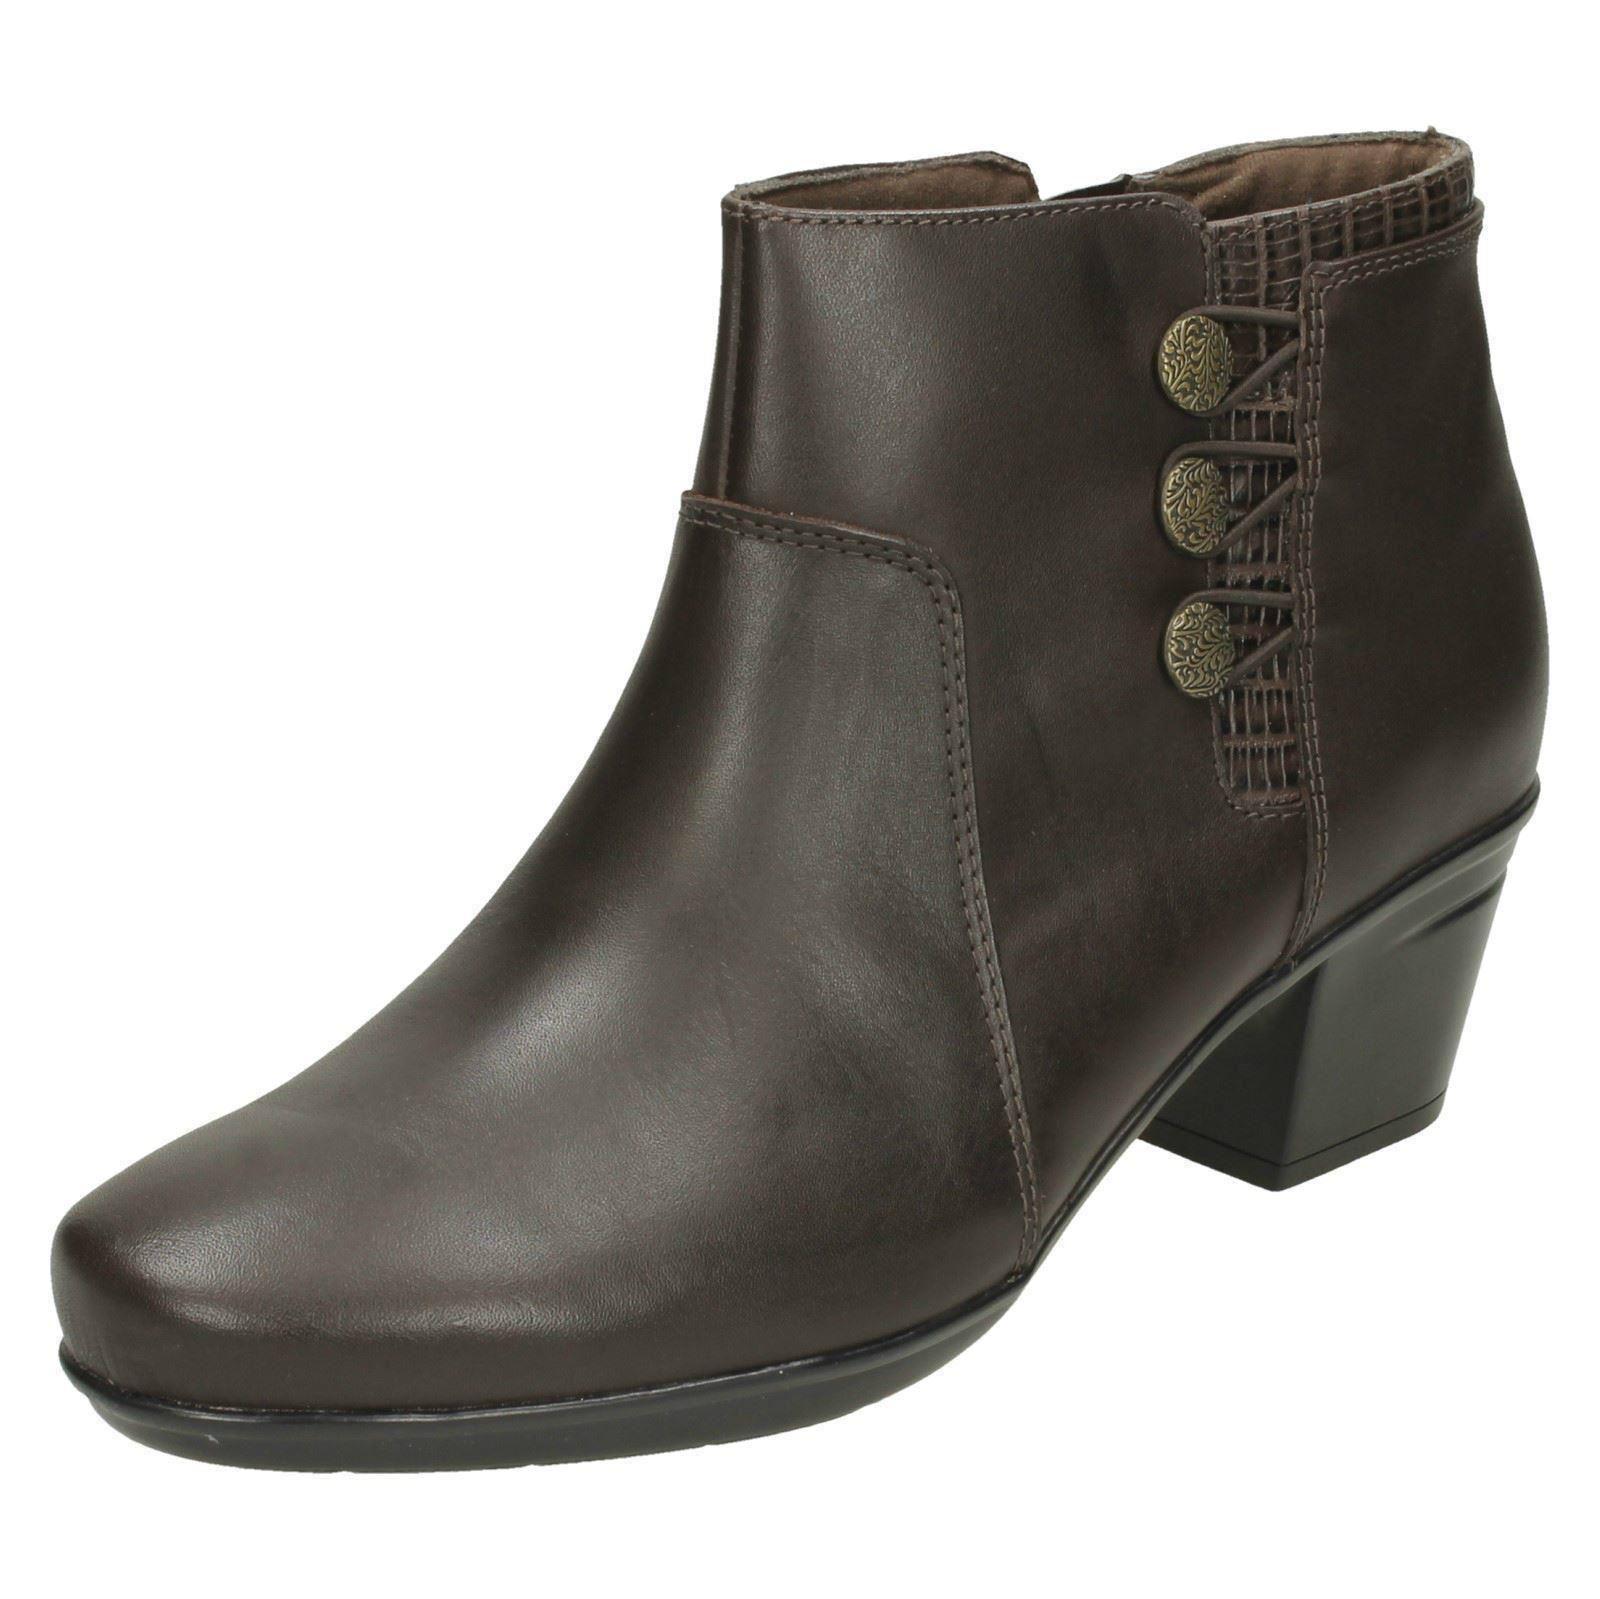 Ladies Clarks Emslie Monet Leather Smart Bnkle Boots E Fitting